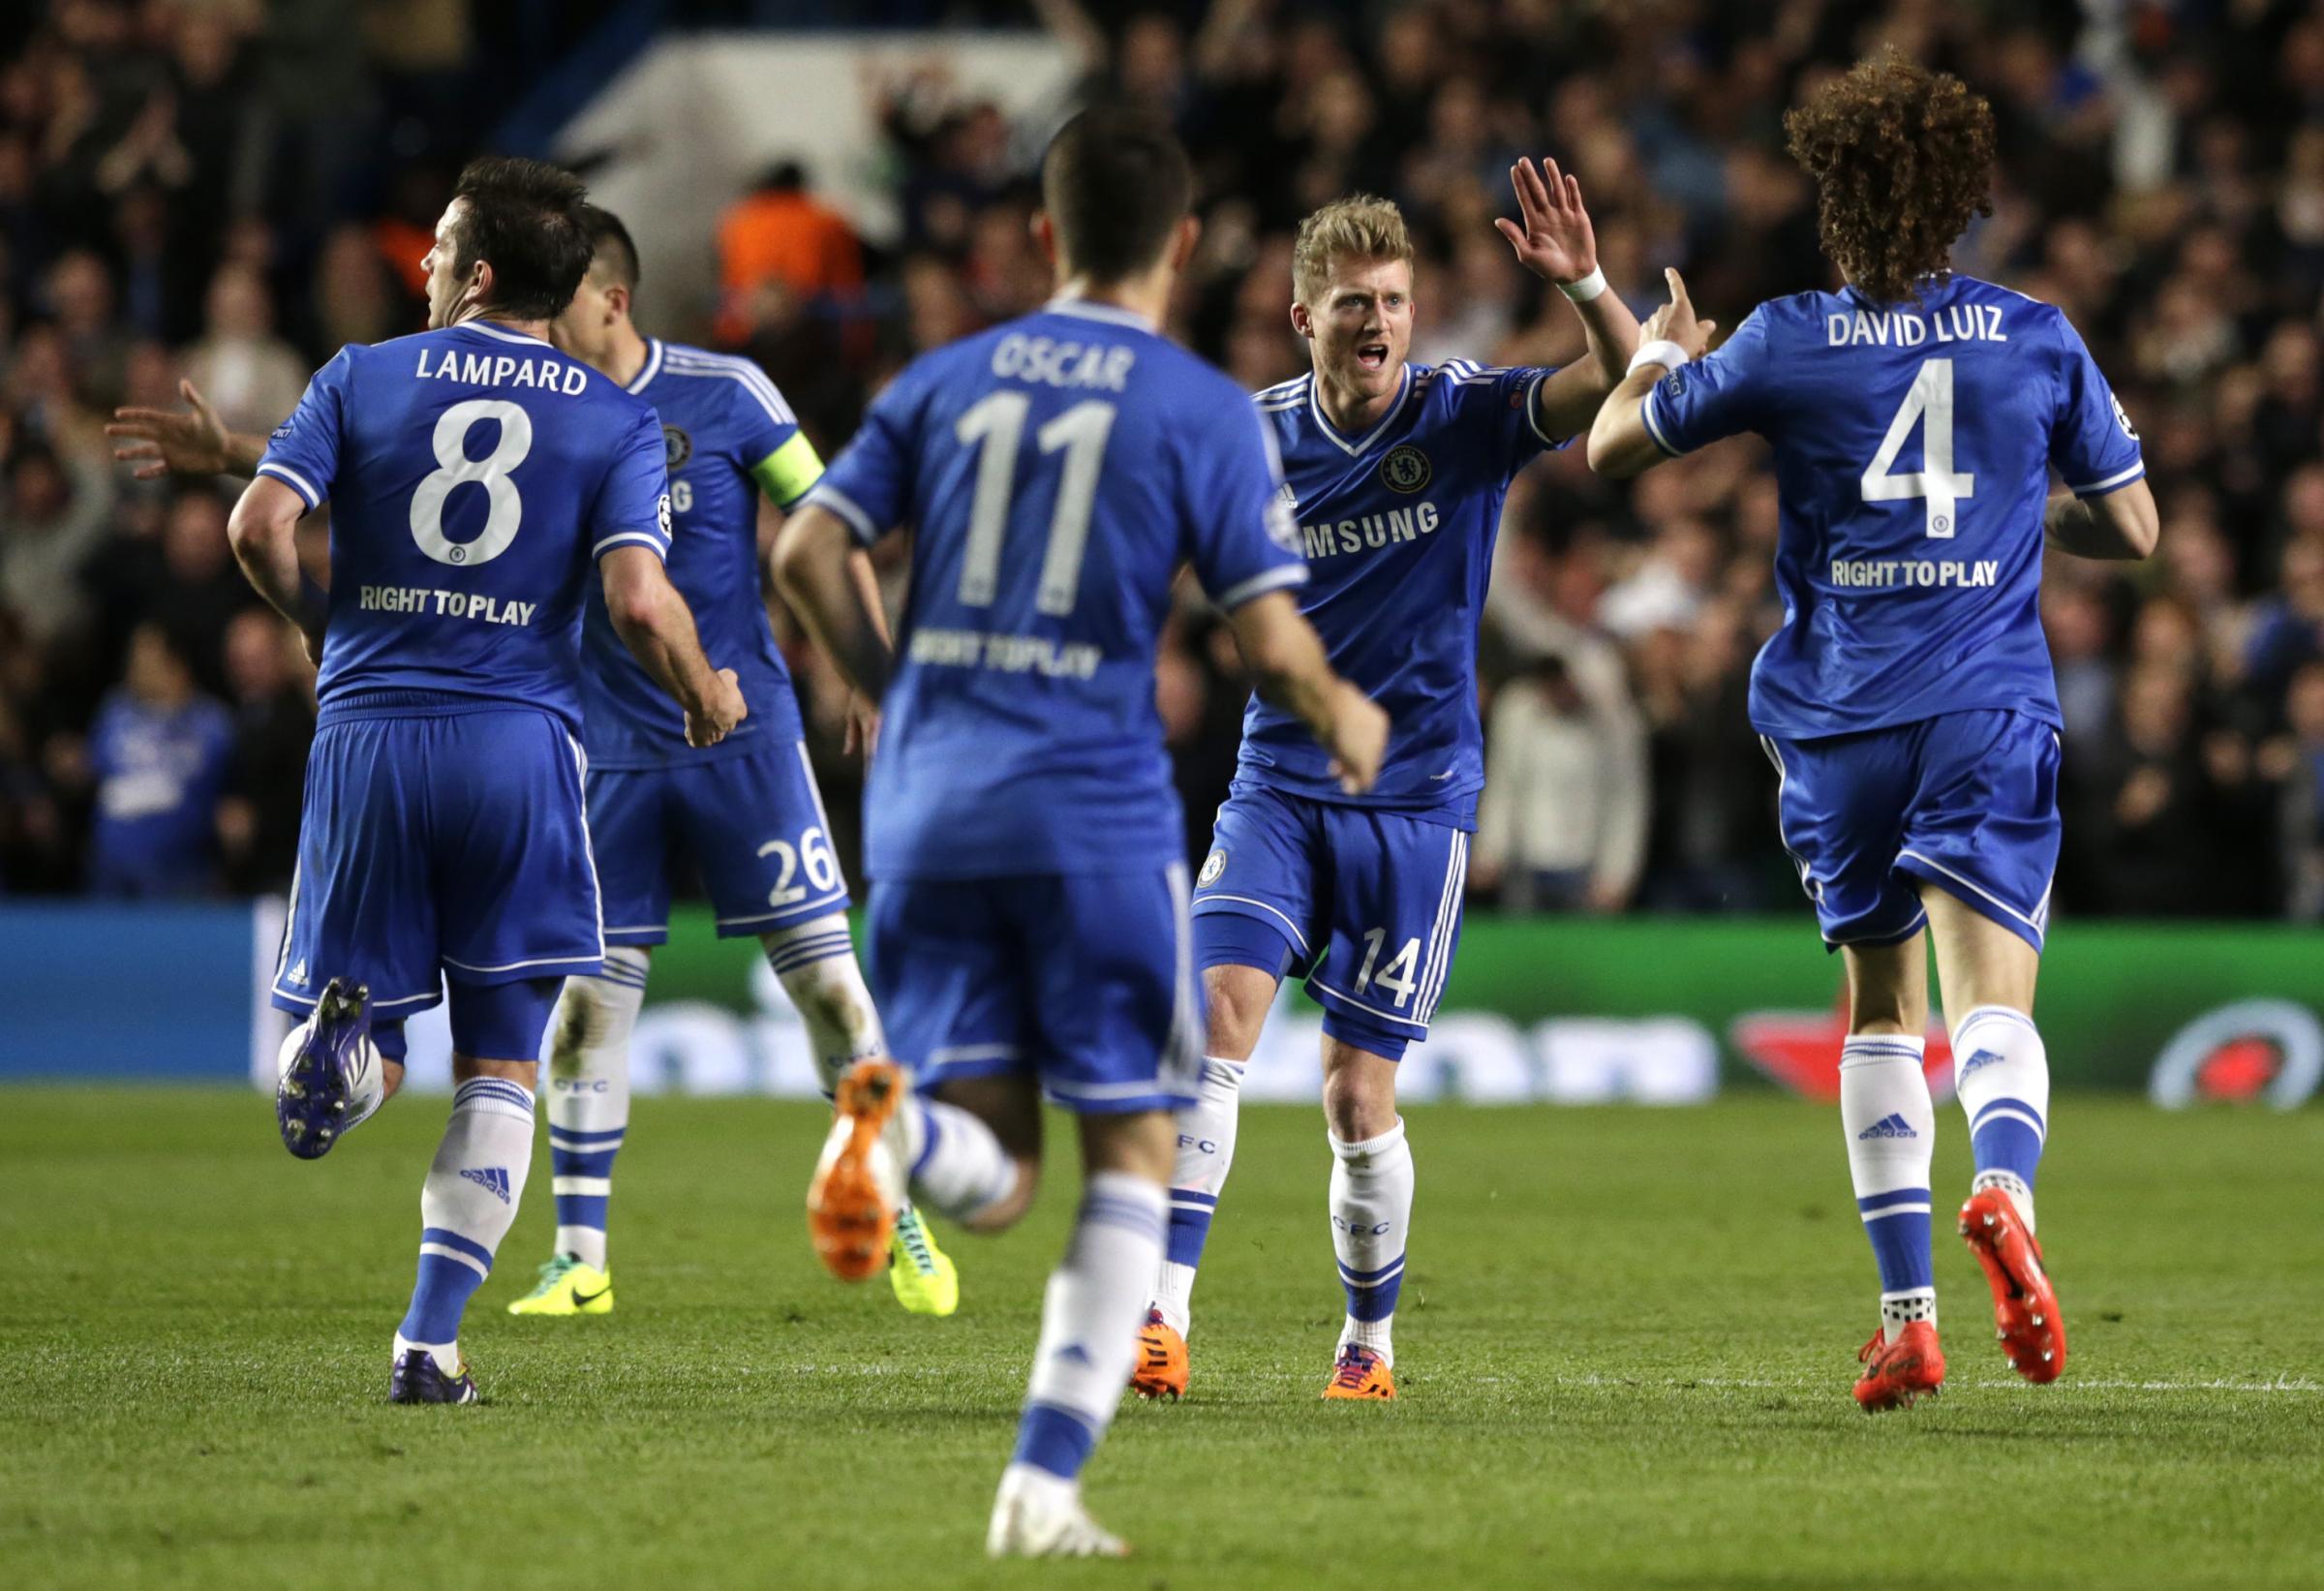 Champions League: spettacolo europeo, passano Chelsea e Real Madrid